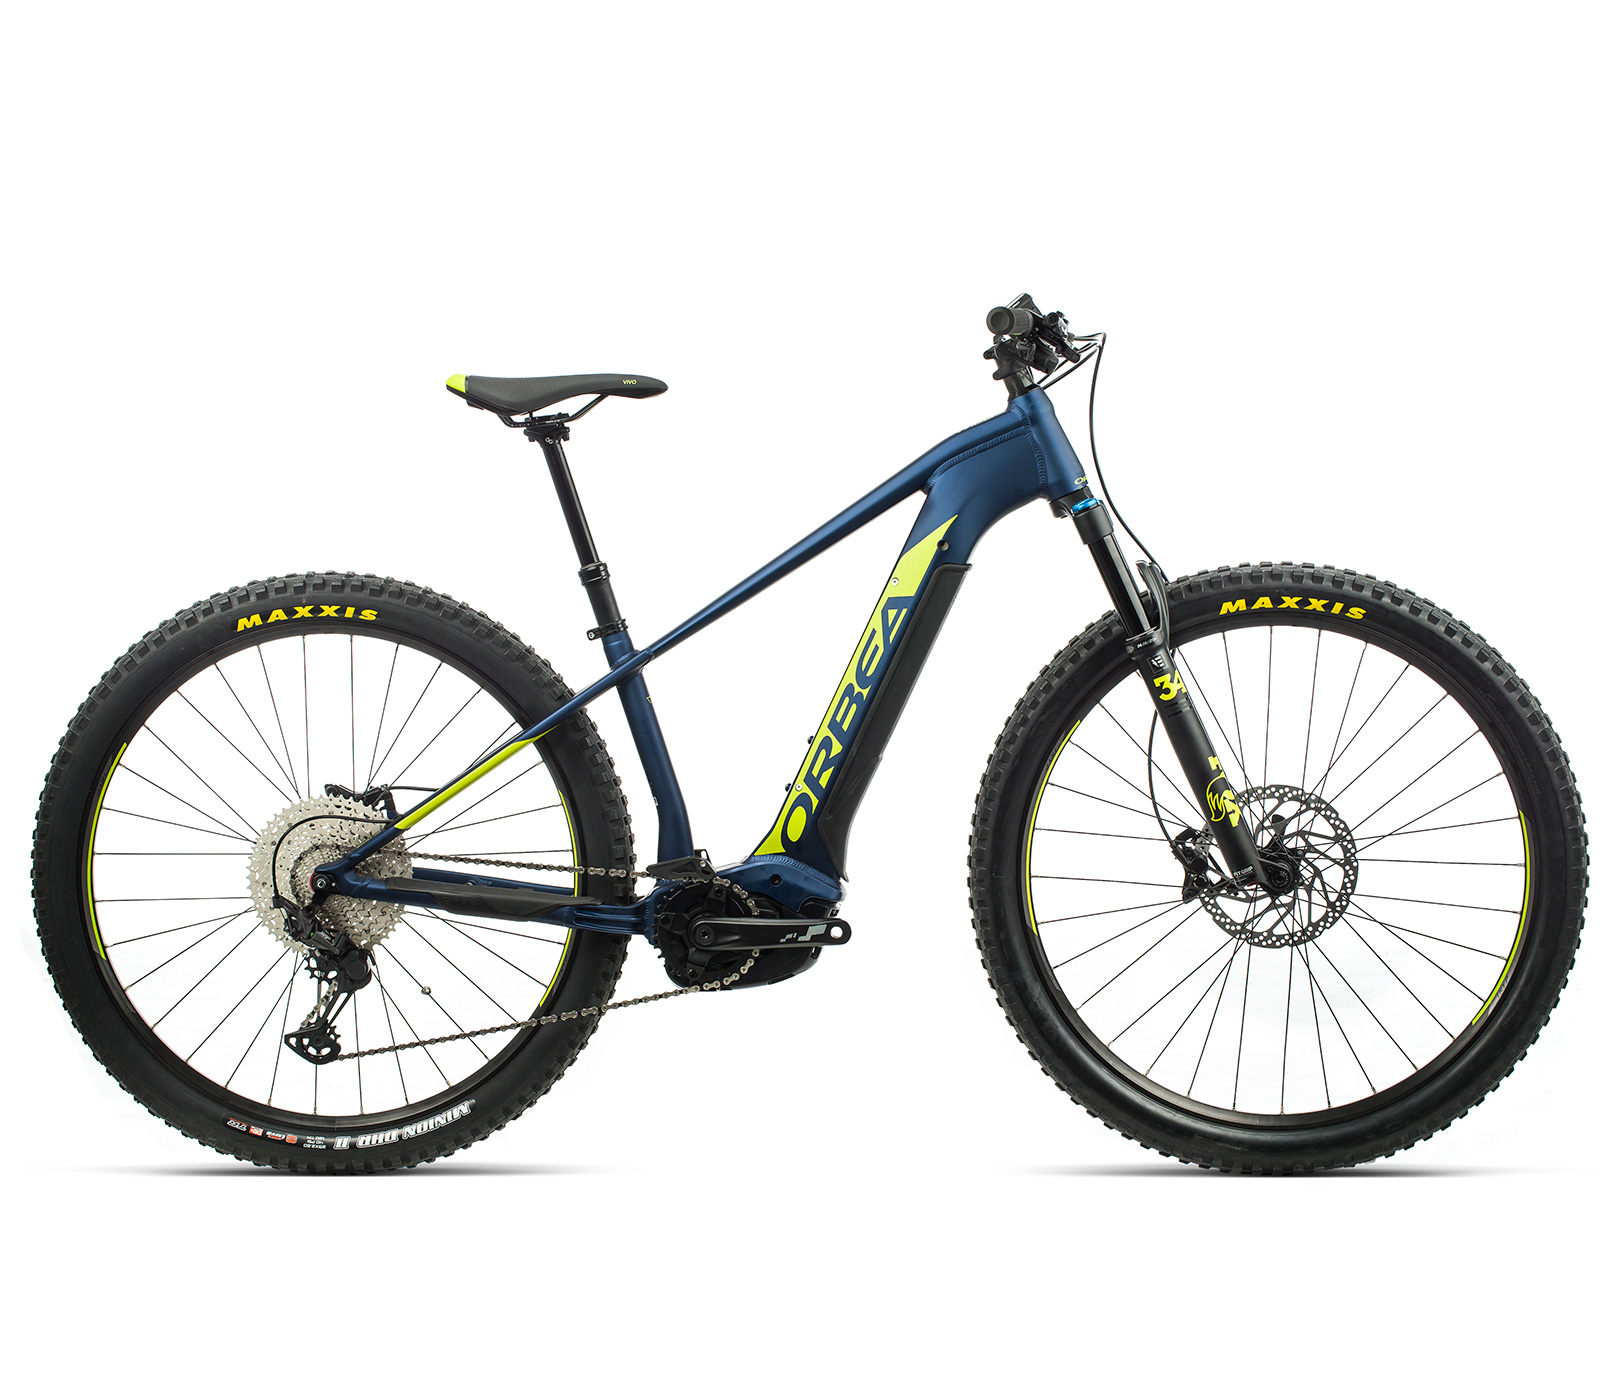 ORBEA WILD HT20 29 ebike - MARINE BLAUW MET / PISTACHE (DOF) @G-Bikes